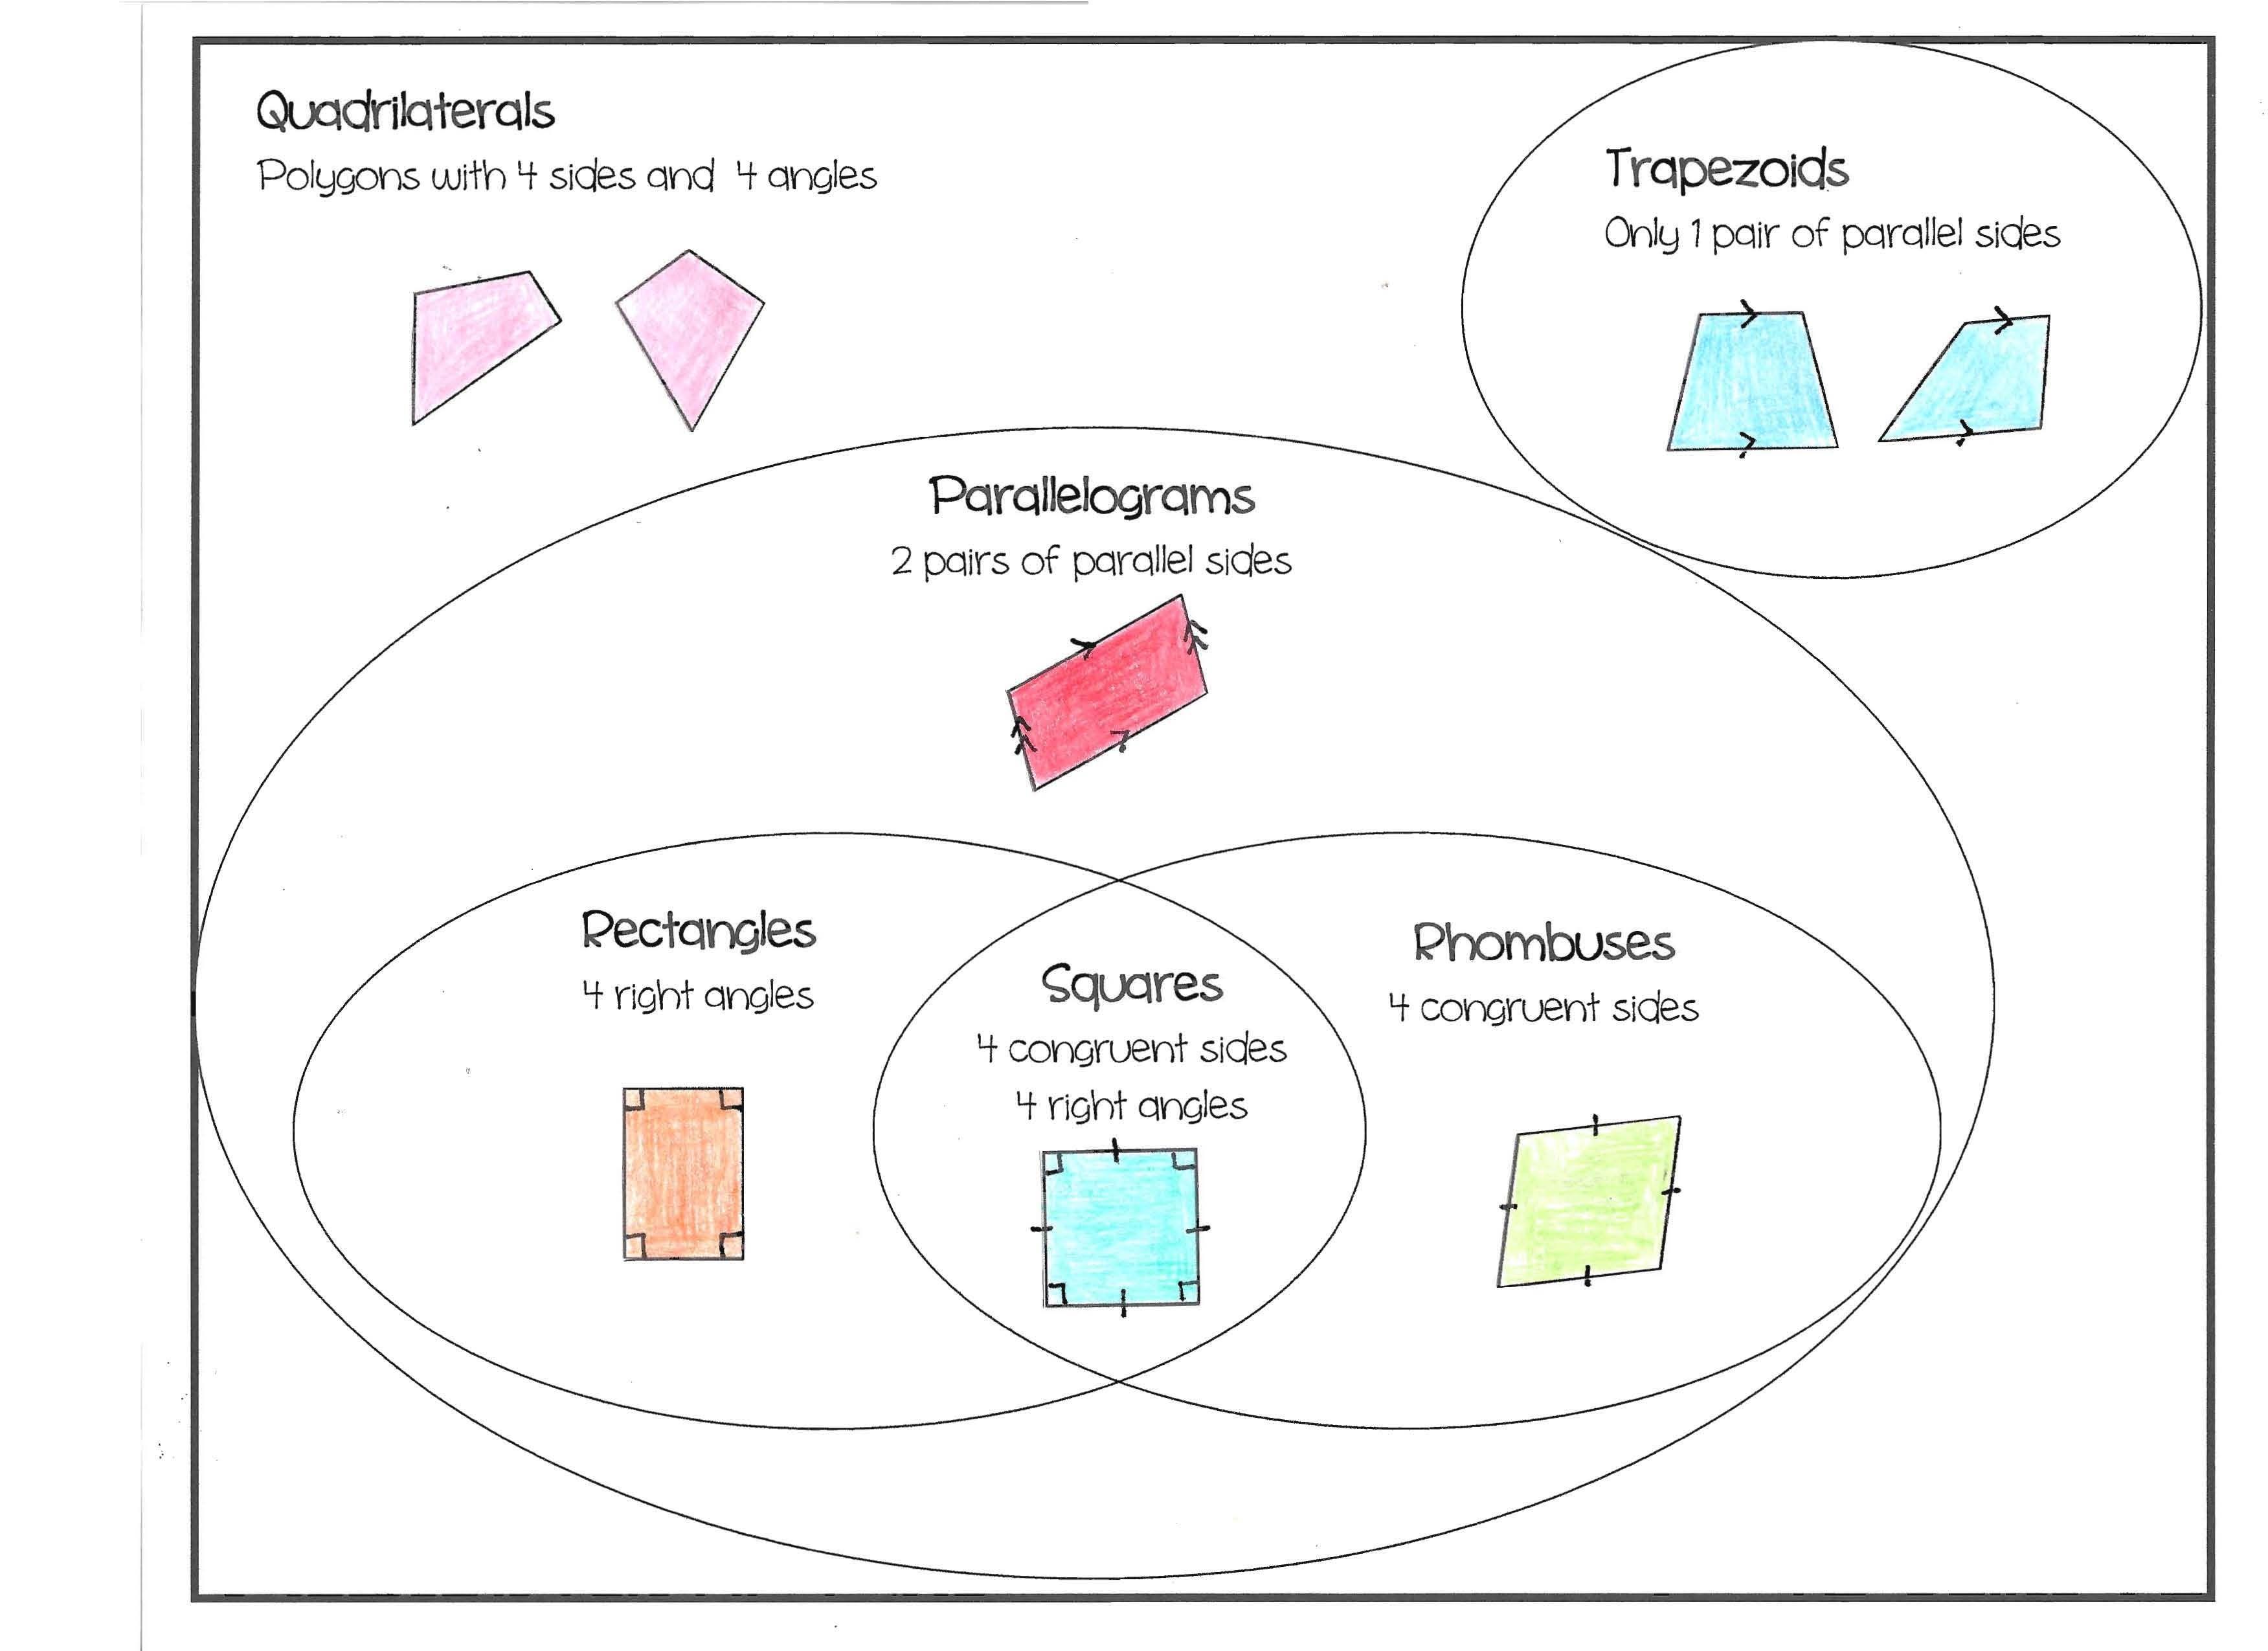 Quadrilateral venn diagram 3rd grade diy wiring diagrams 3 of 3 classifying quadrilaterals answer key grade 7 pre algebra rh pinterest com downloadable venn diagram template sample venn diagram ccuart Gallery